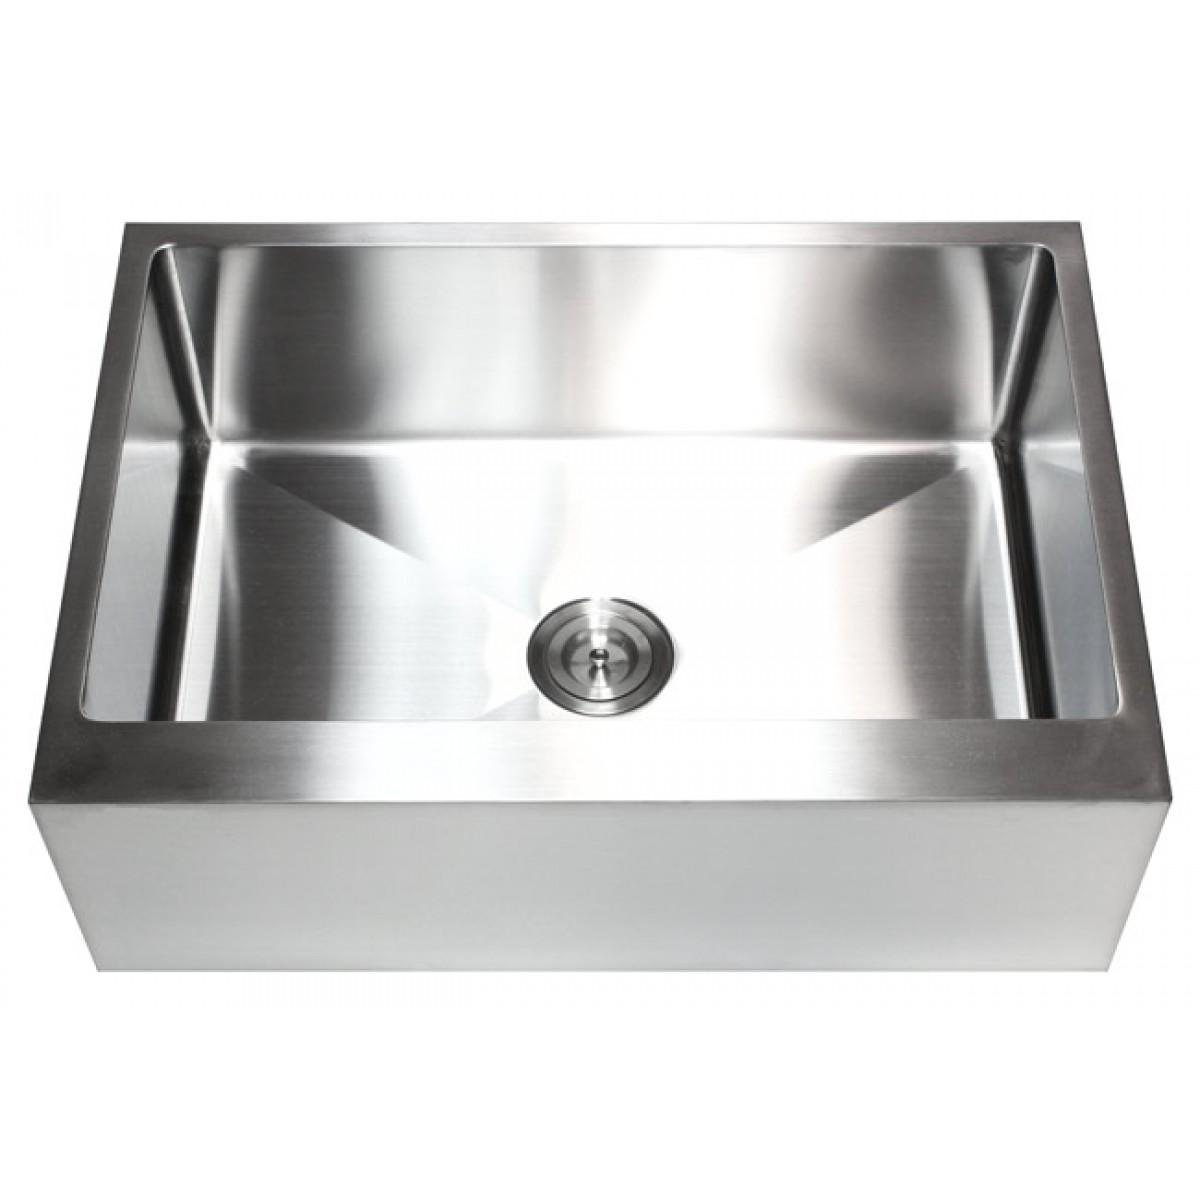 30 Inch Stainless Steel Flat Front Farm Apron Single Bowl Kitchen Sink 15mm Radius Design 16 Gauge